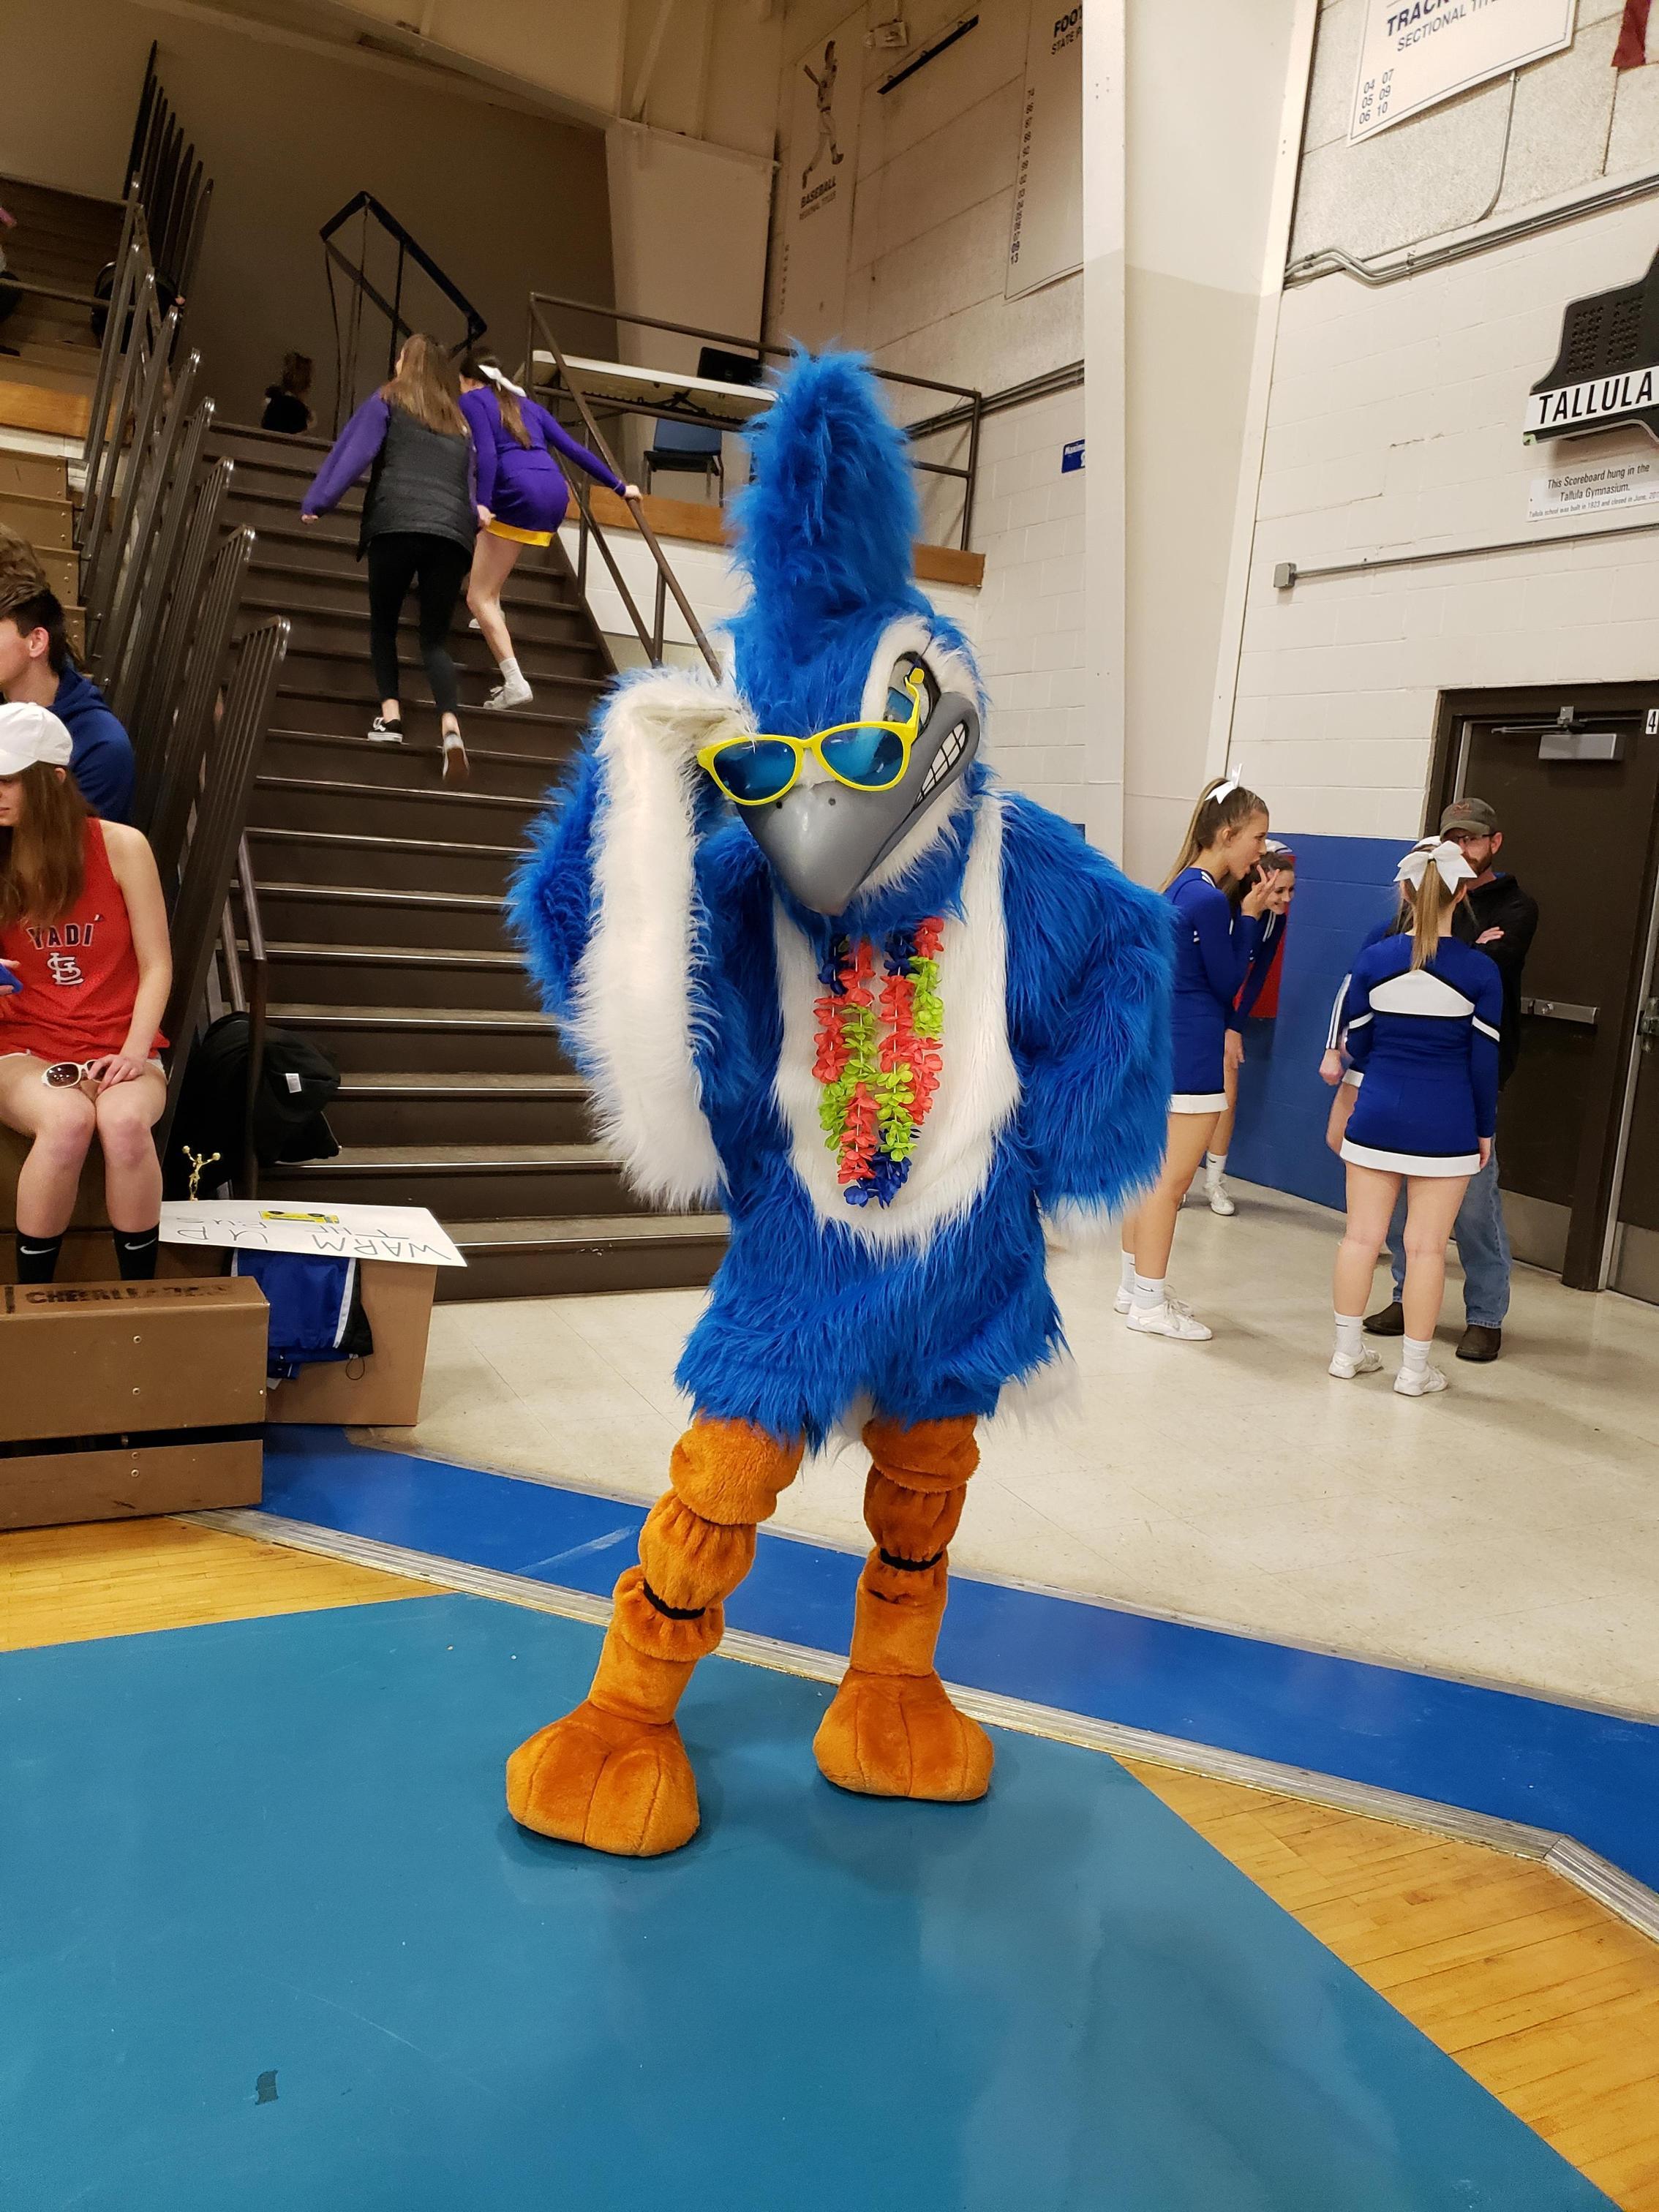 Bluejay mascot pic